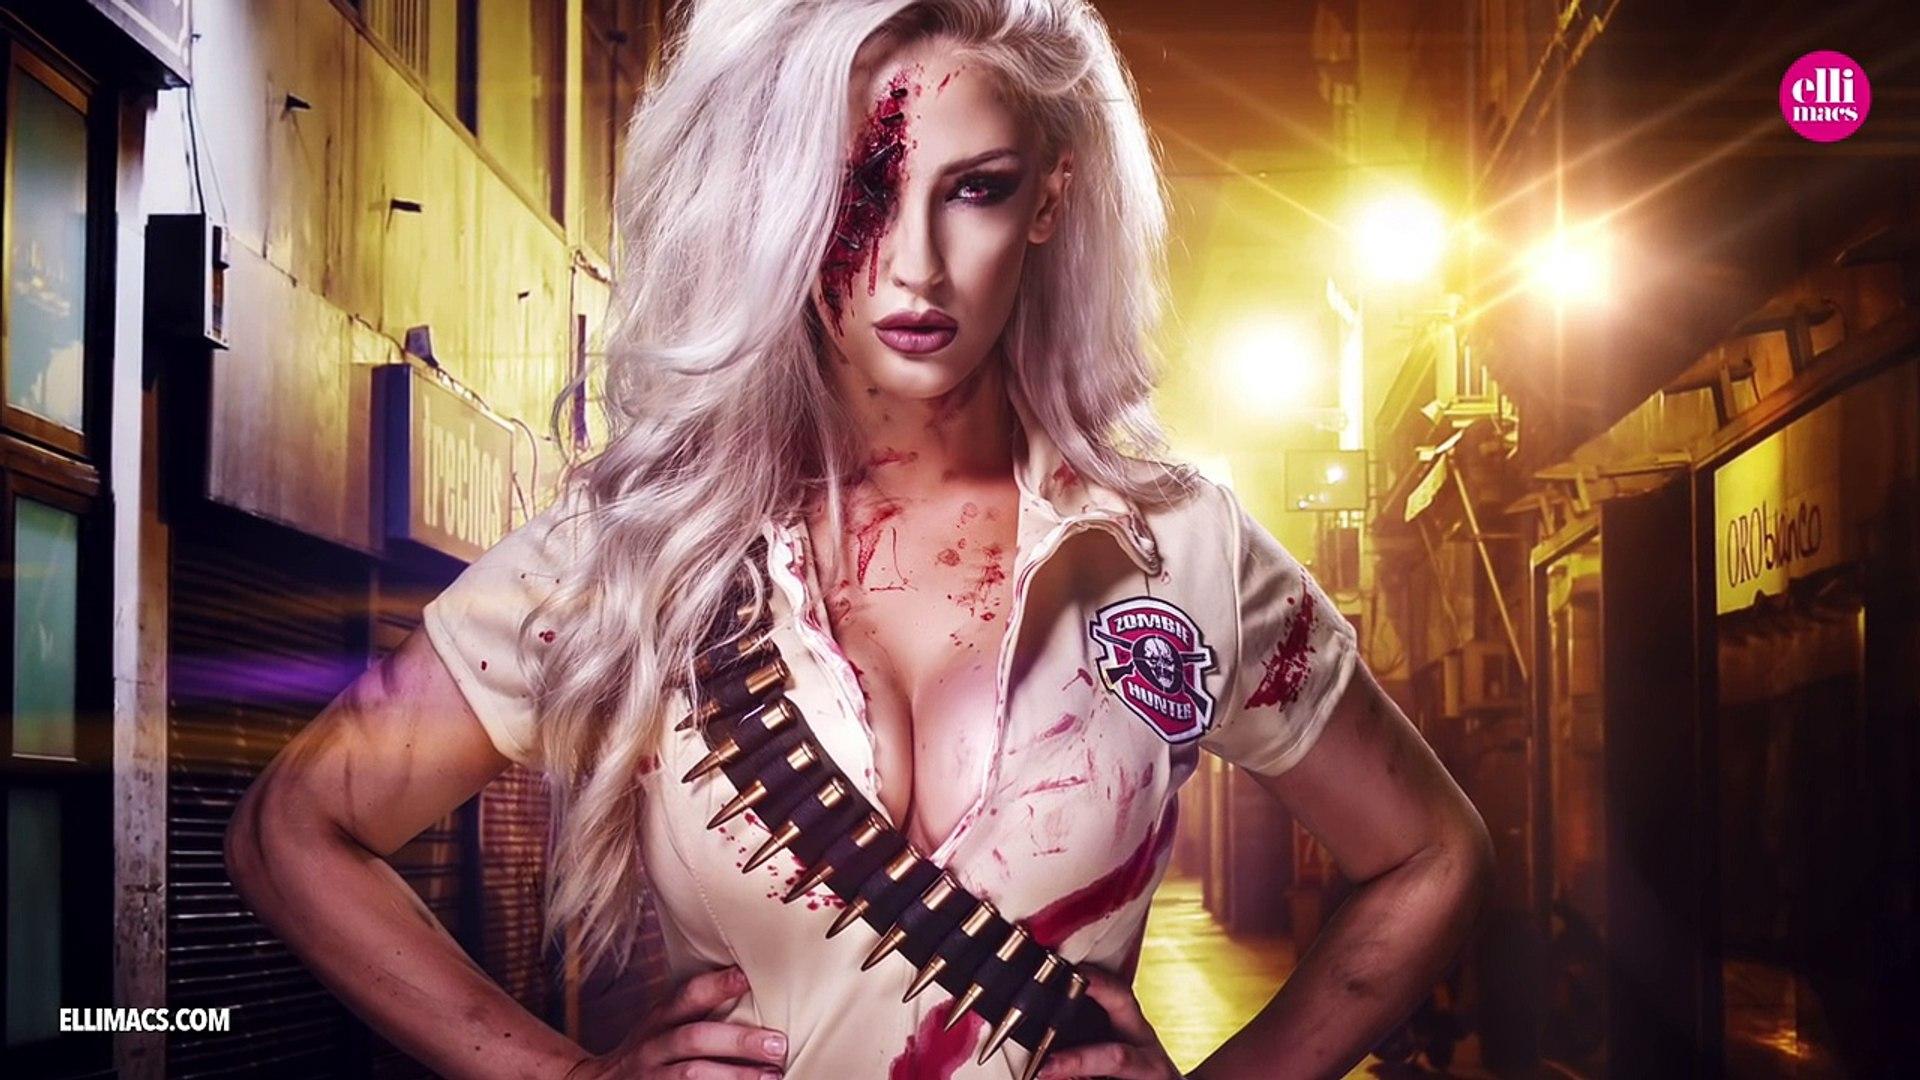 Zombie hunter makeup and costume idea